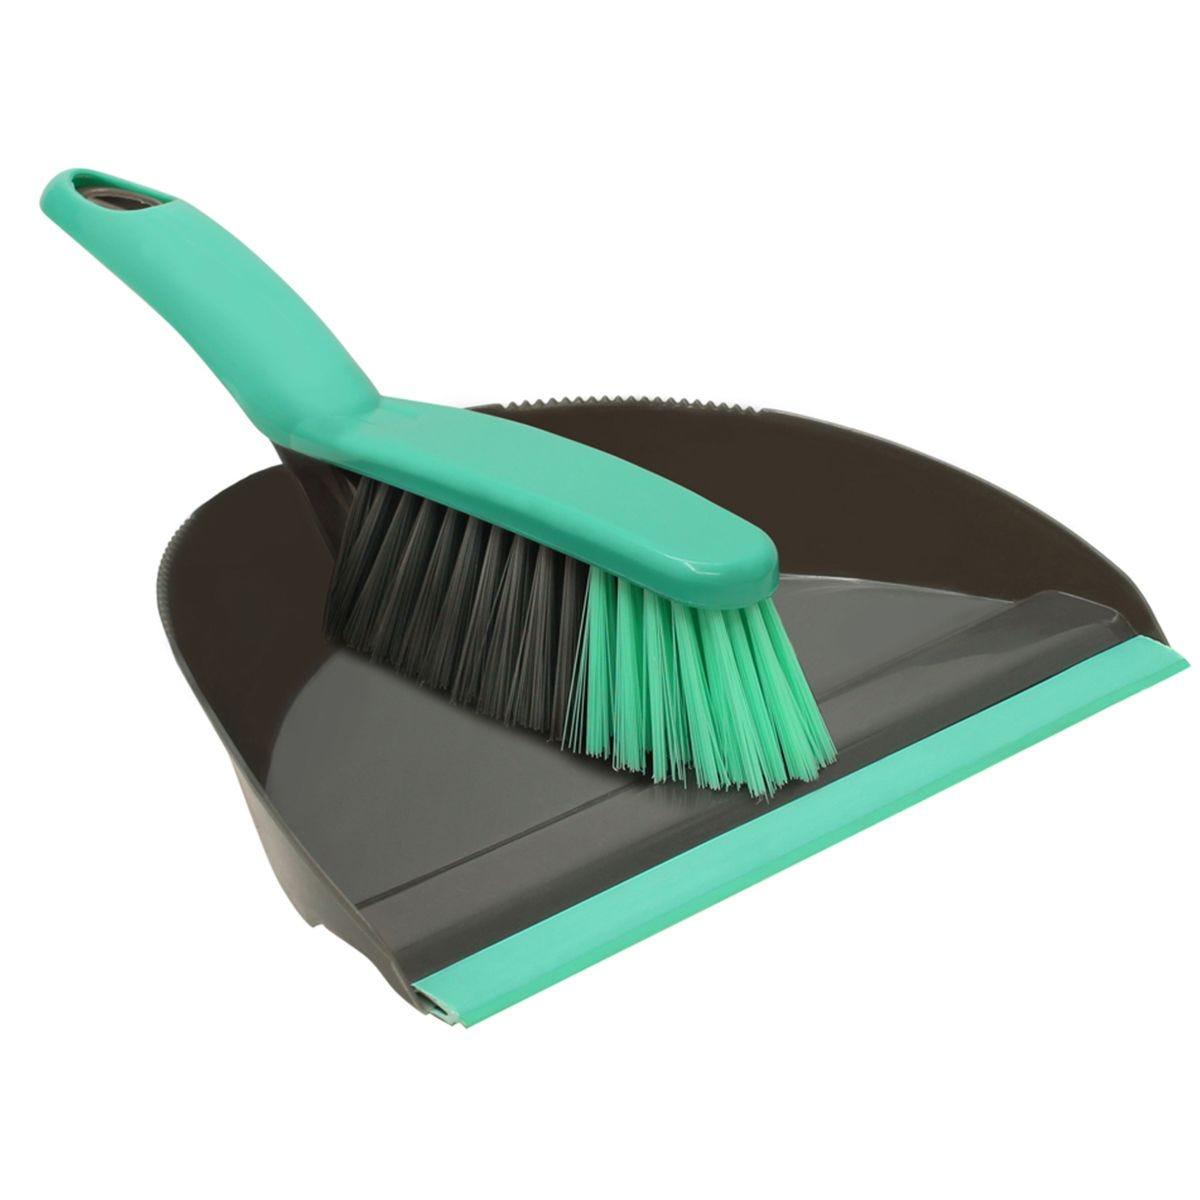 JVL Dustpan and Bristle Brush Set Grey/Turquoise